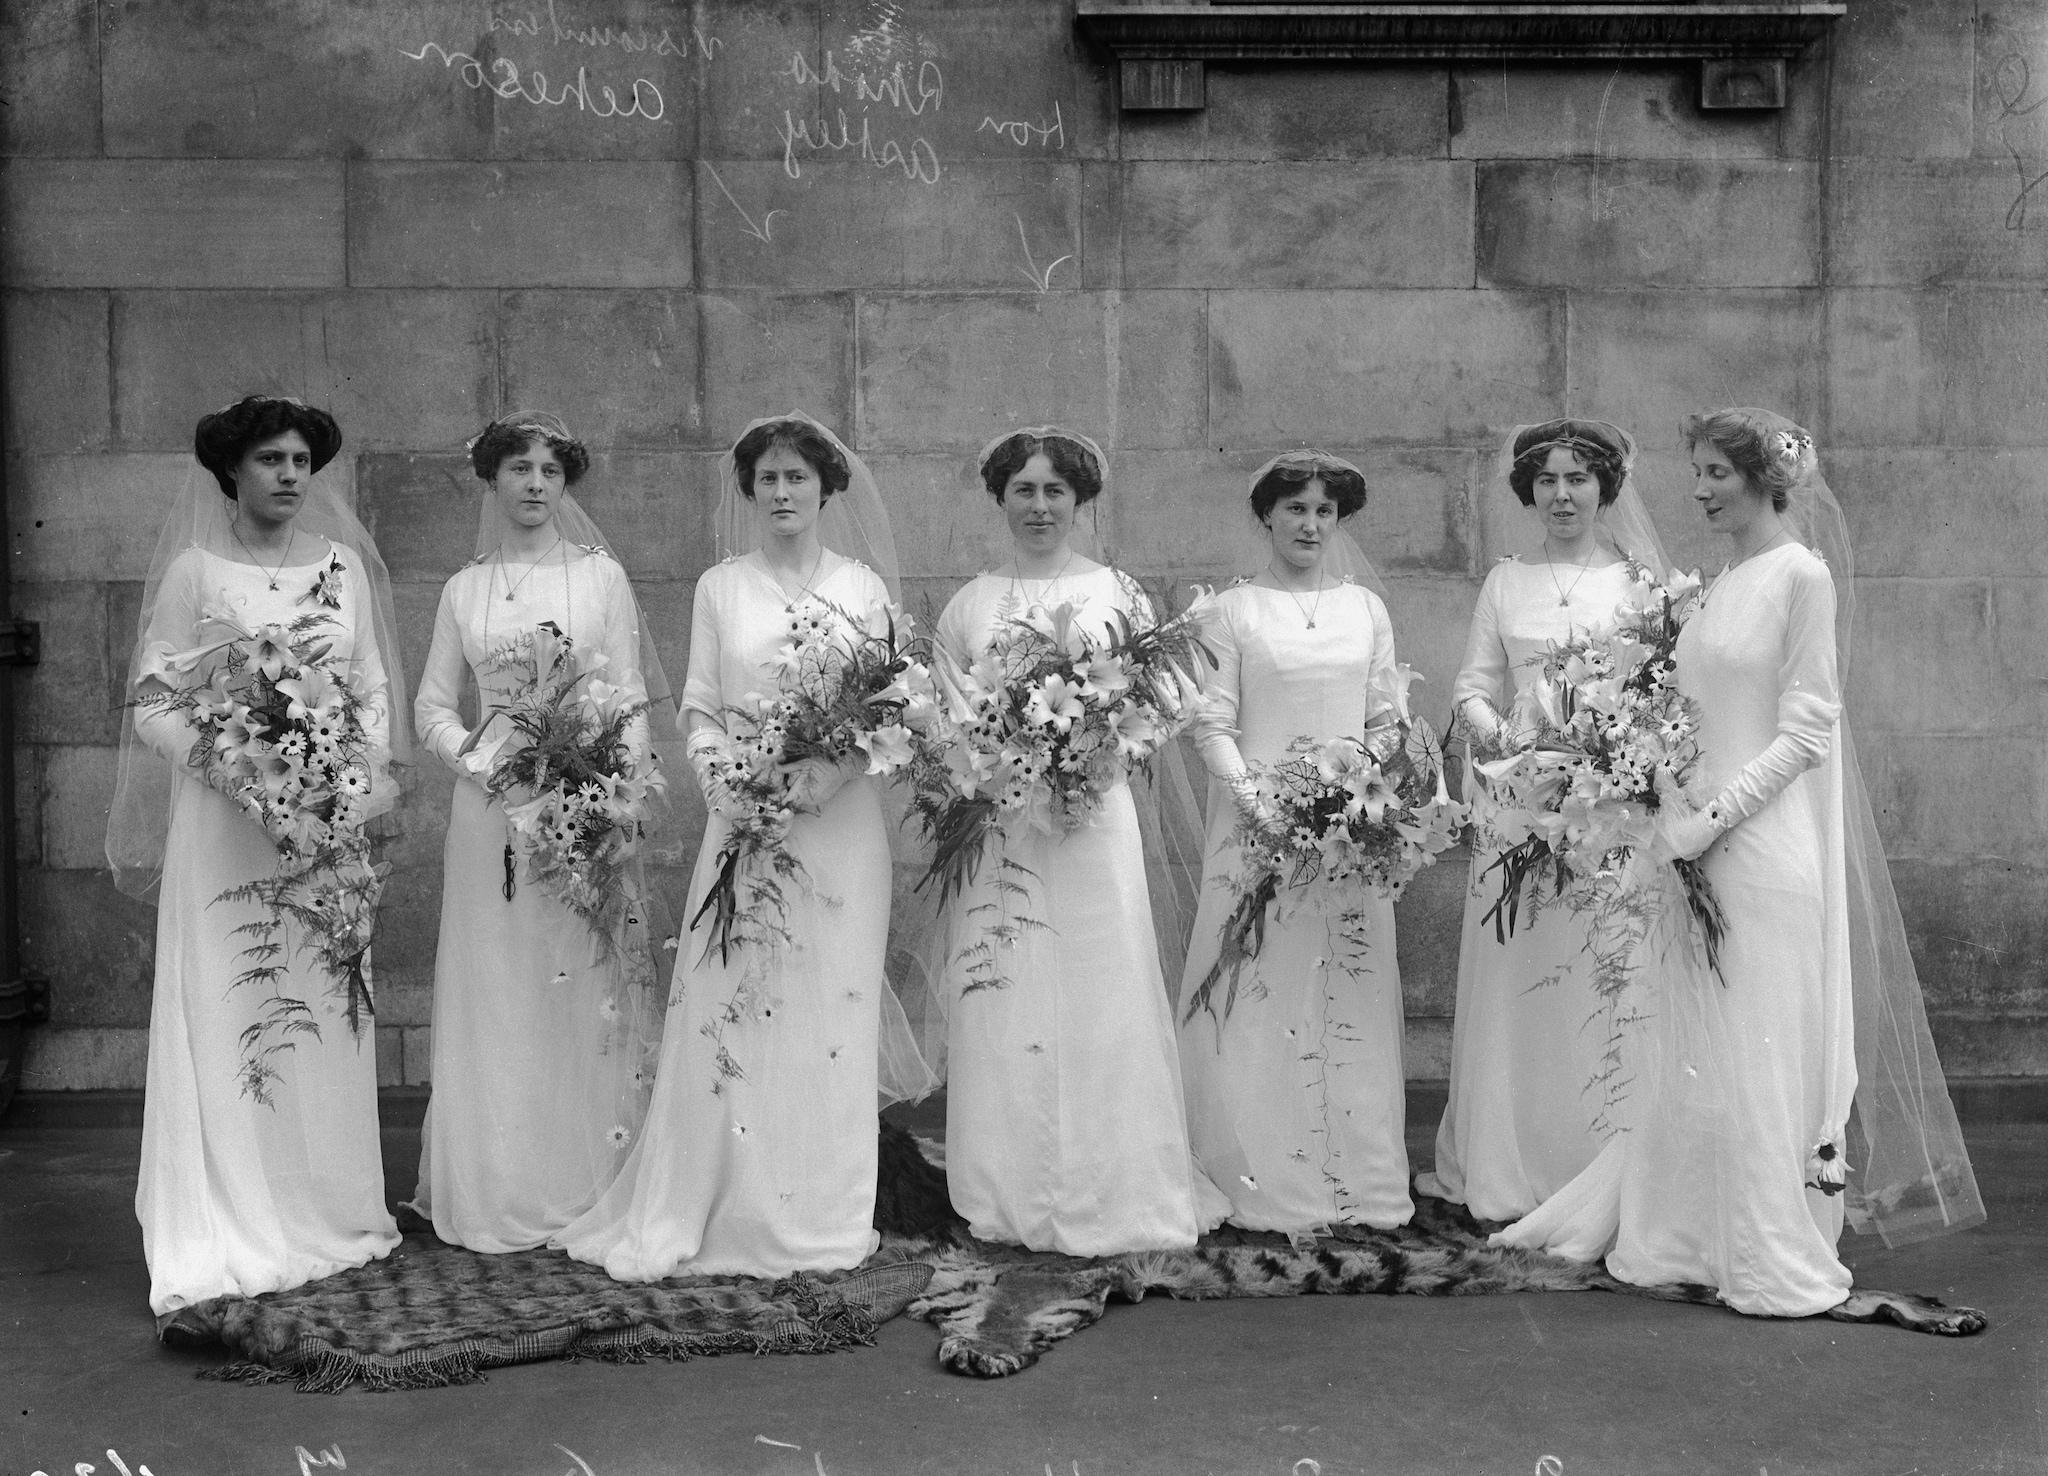 Damigelle nel 1910